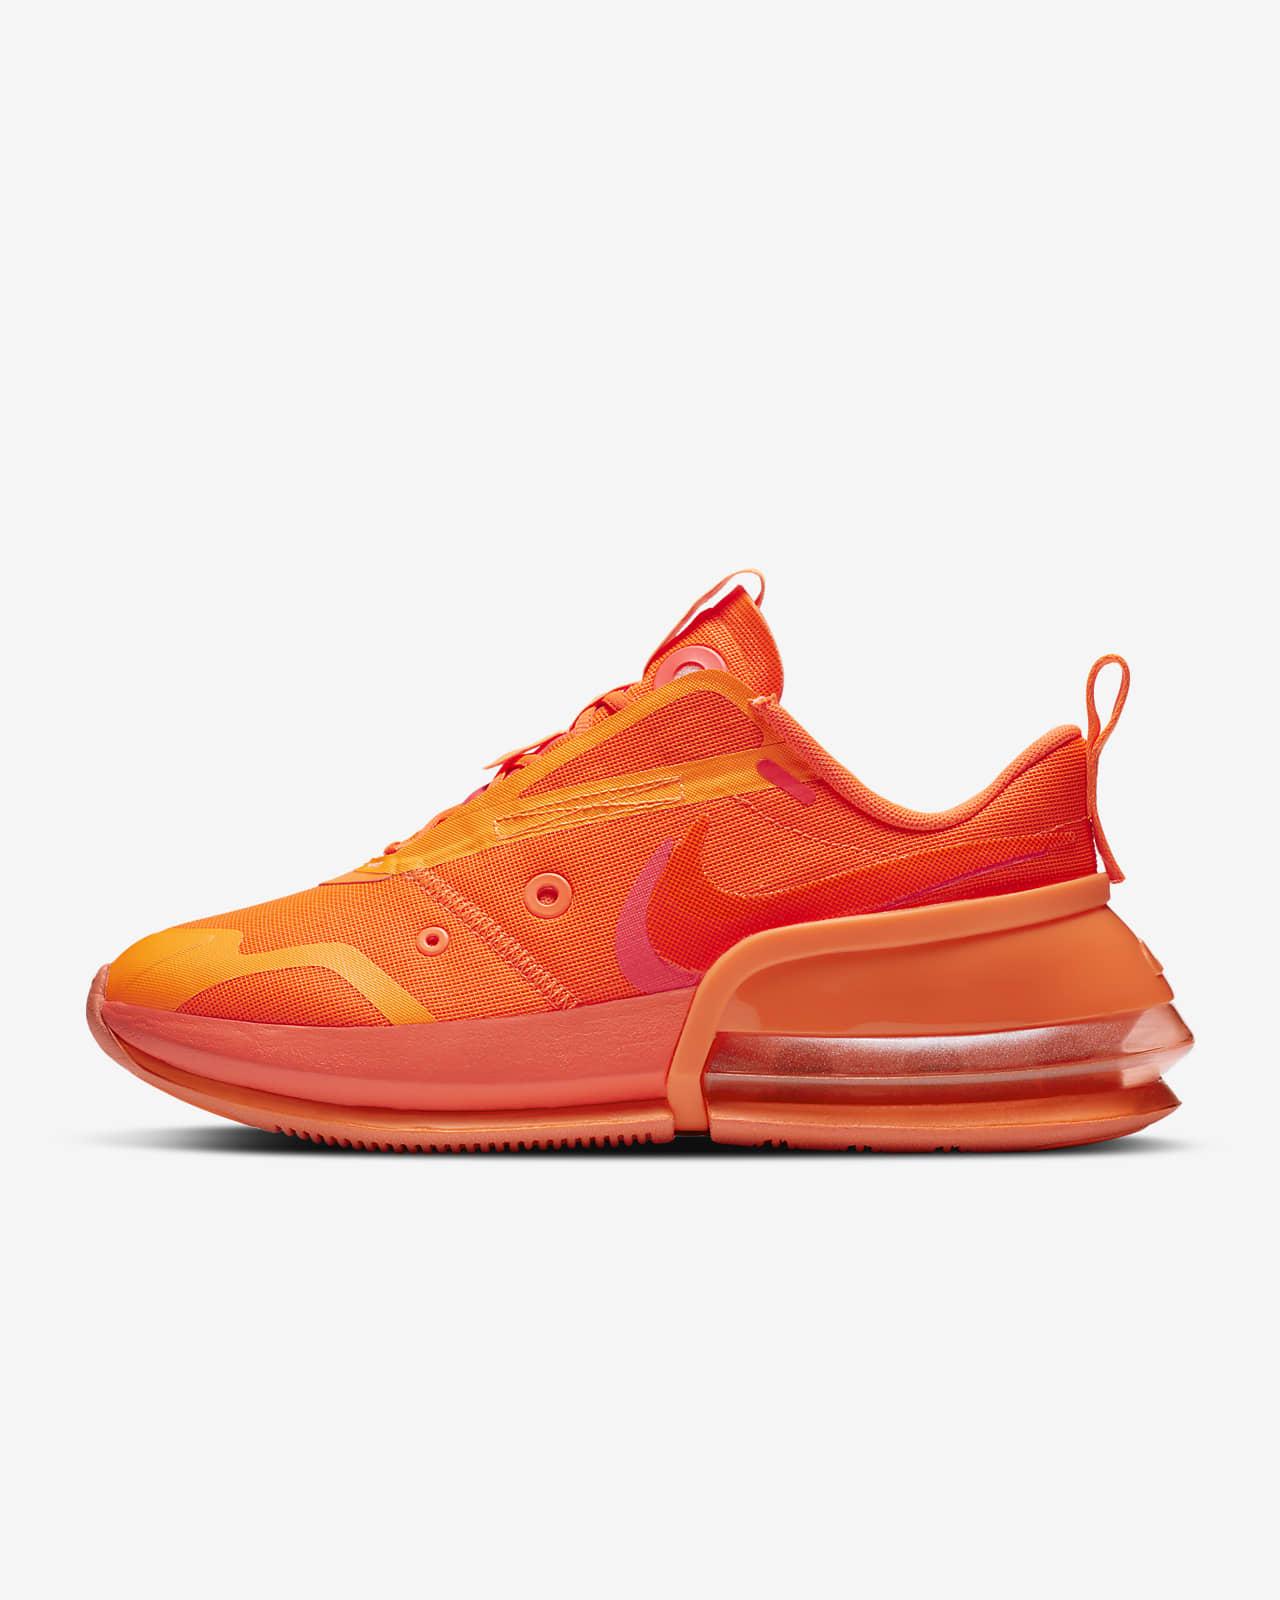 Nike Air Max Up NRG Damenschuh